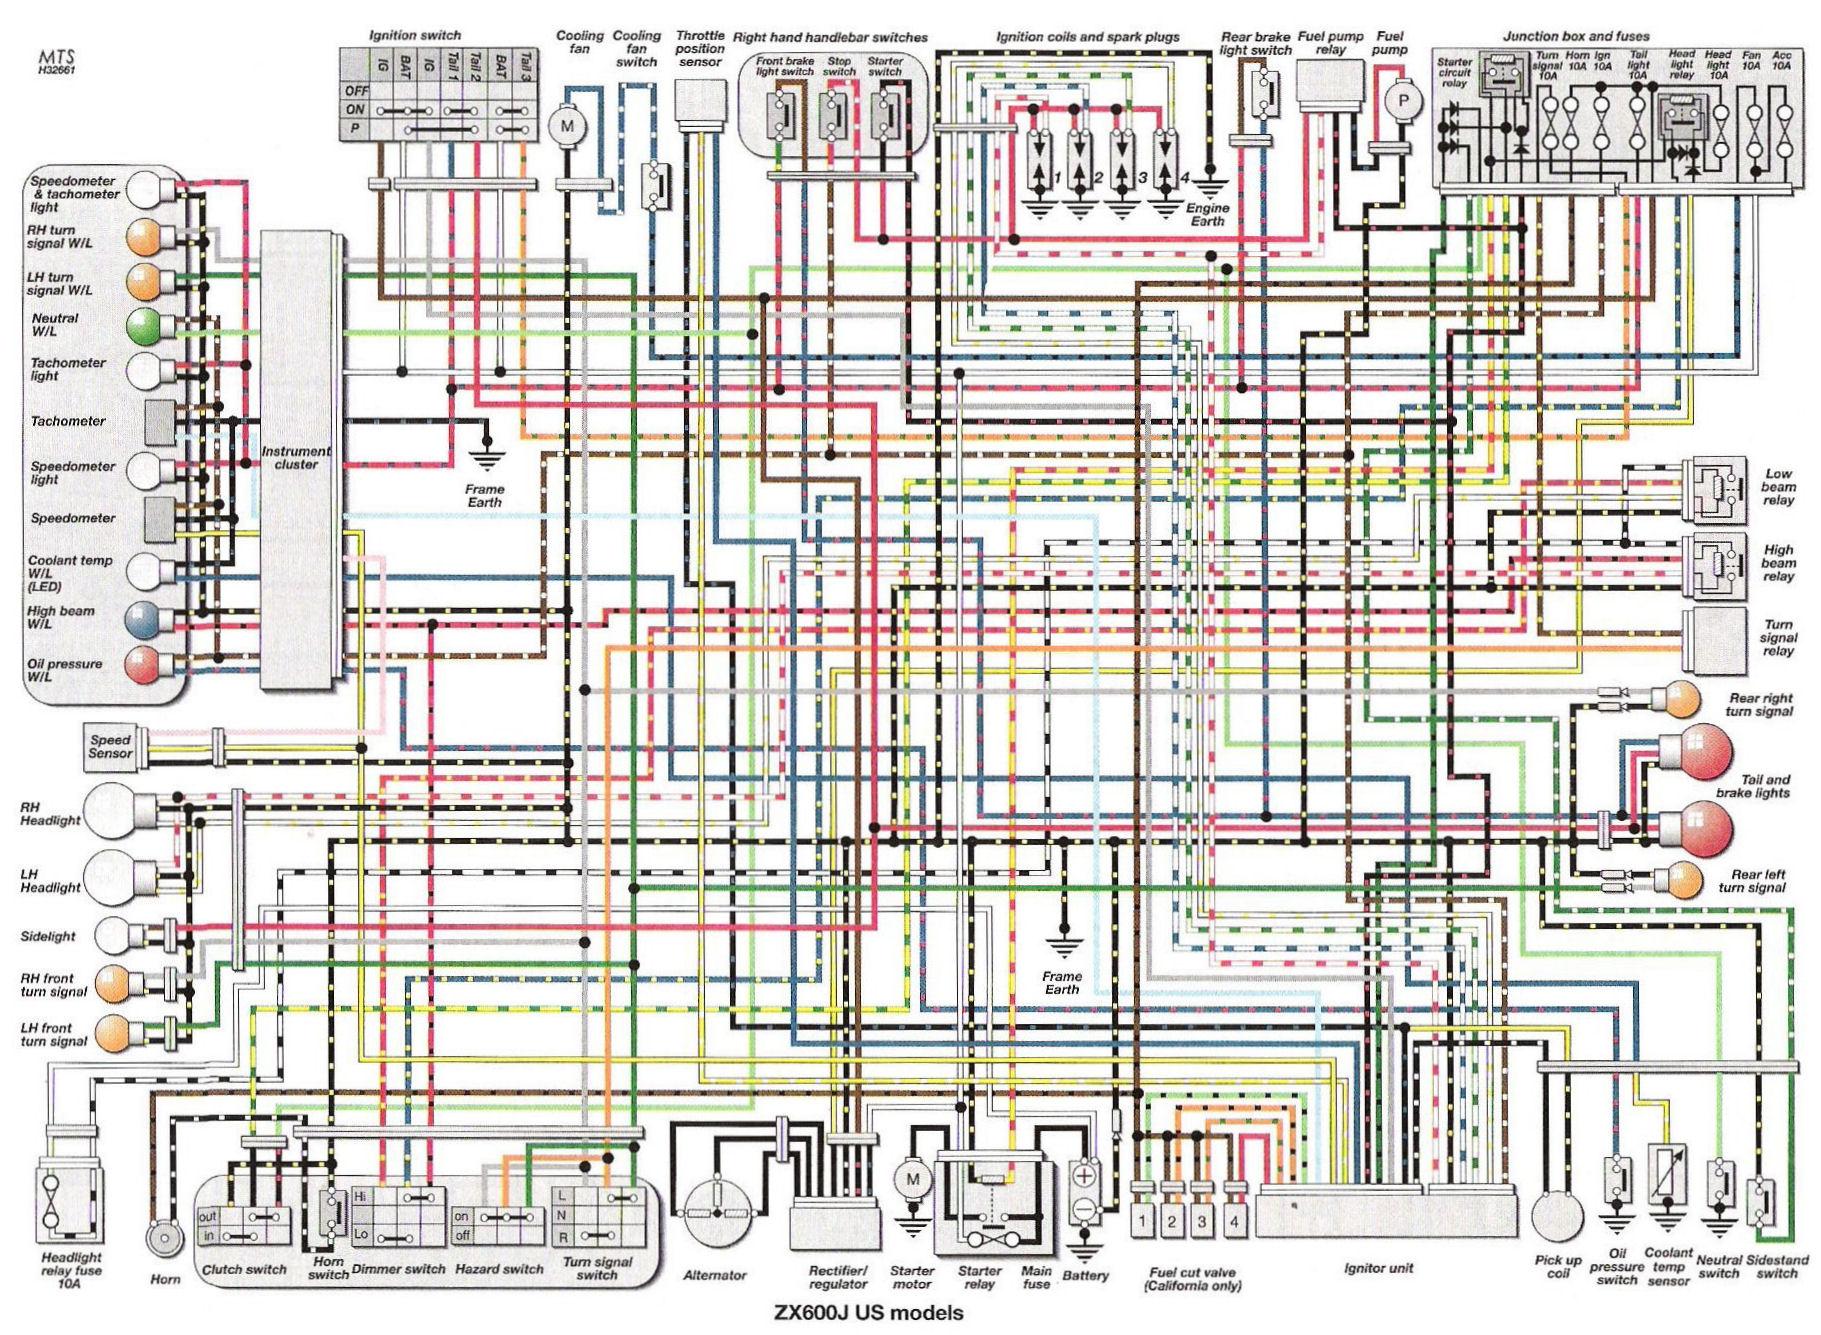 Yamaha 2008 R1 Wire Diagram | Wiring Diagram on